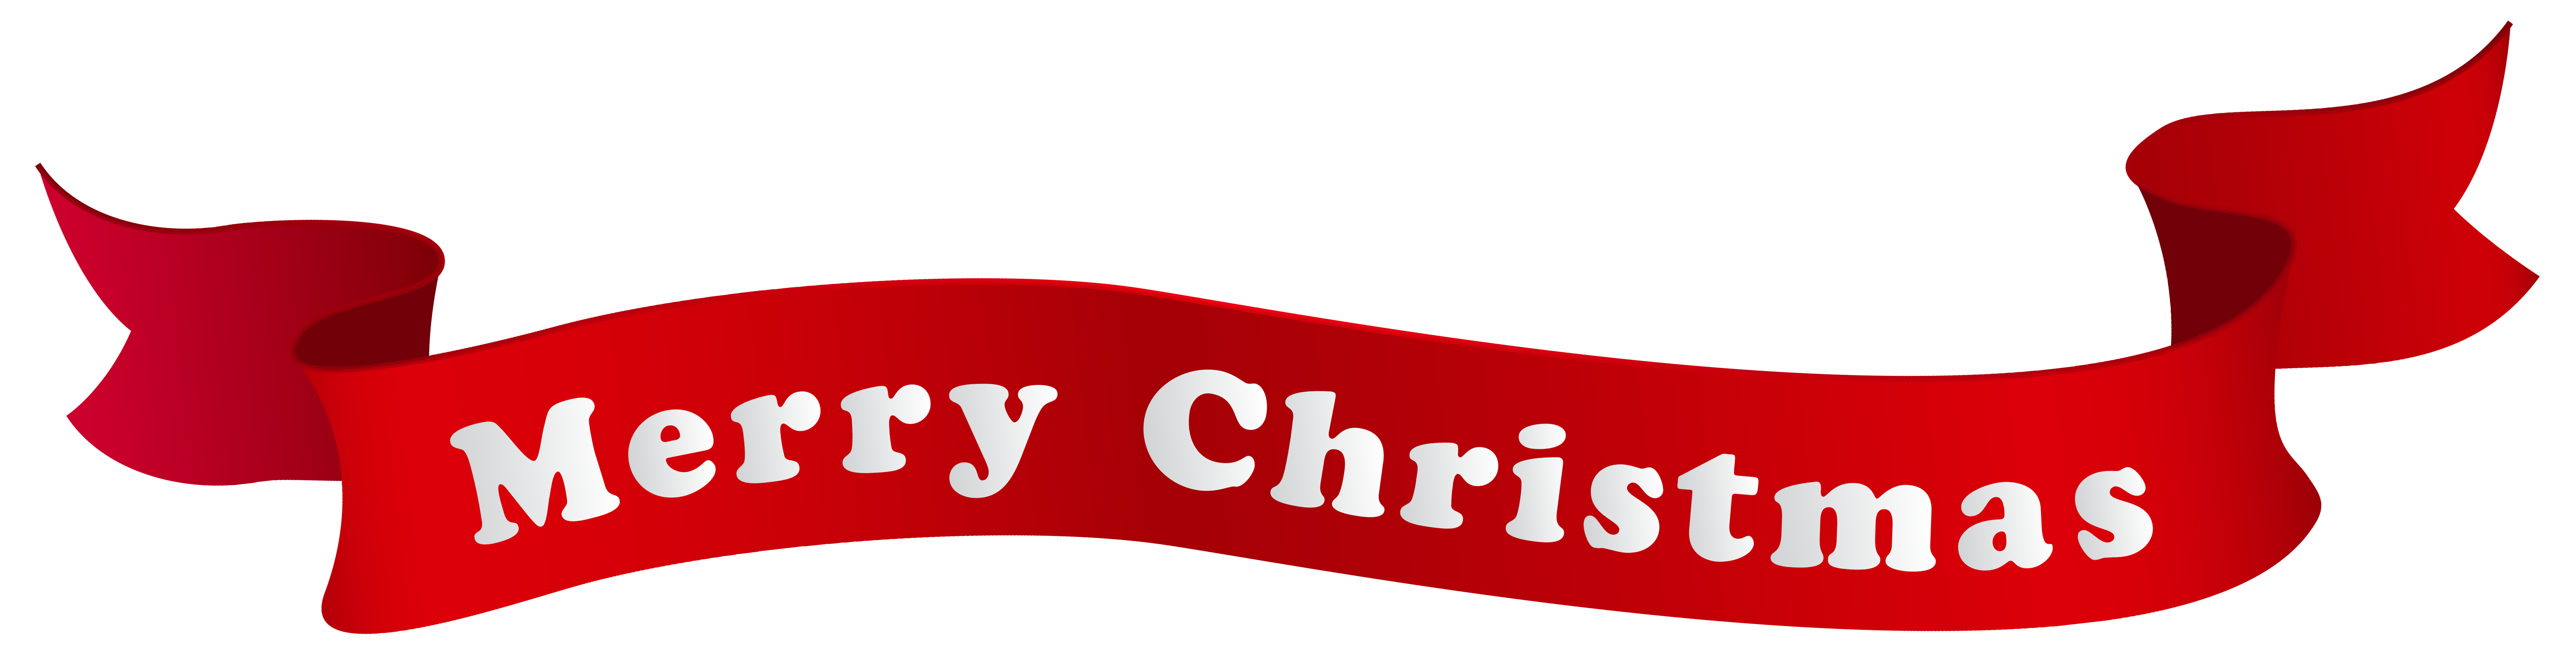 Merry Christmas Banners Clip Art-Merry christmas banners clip art-16